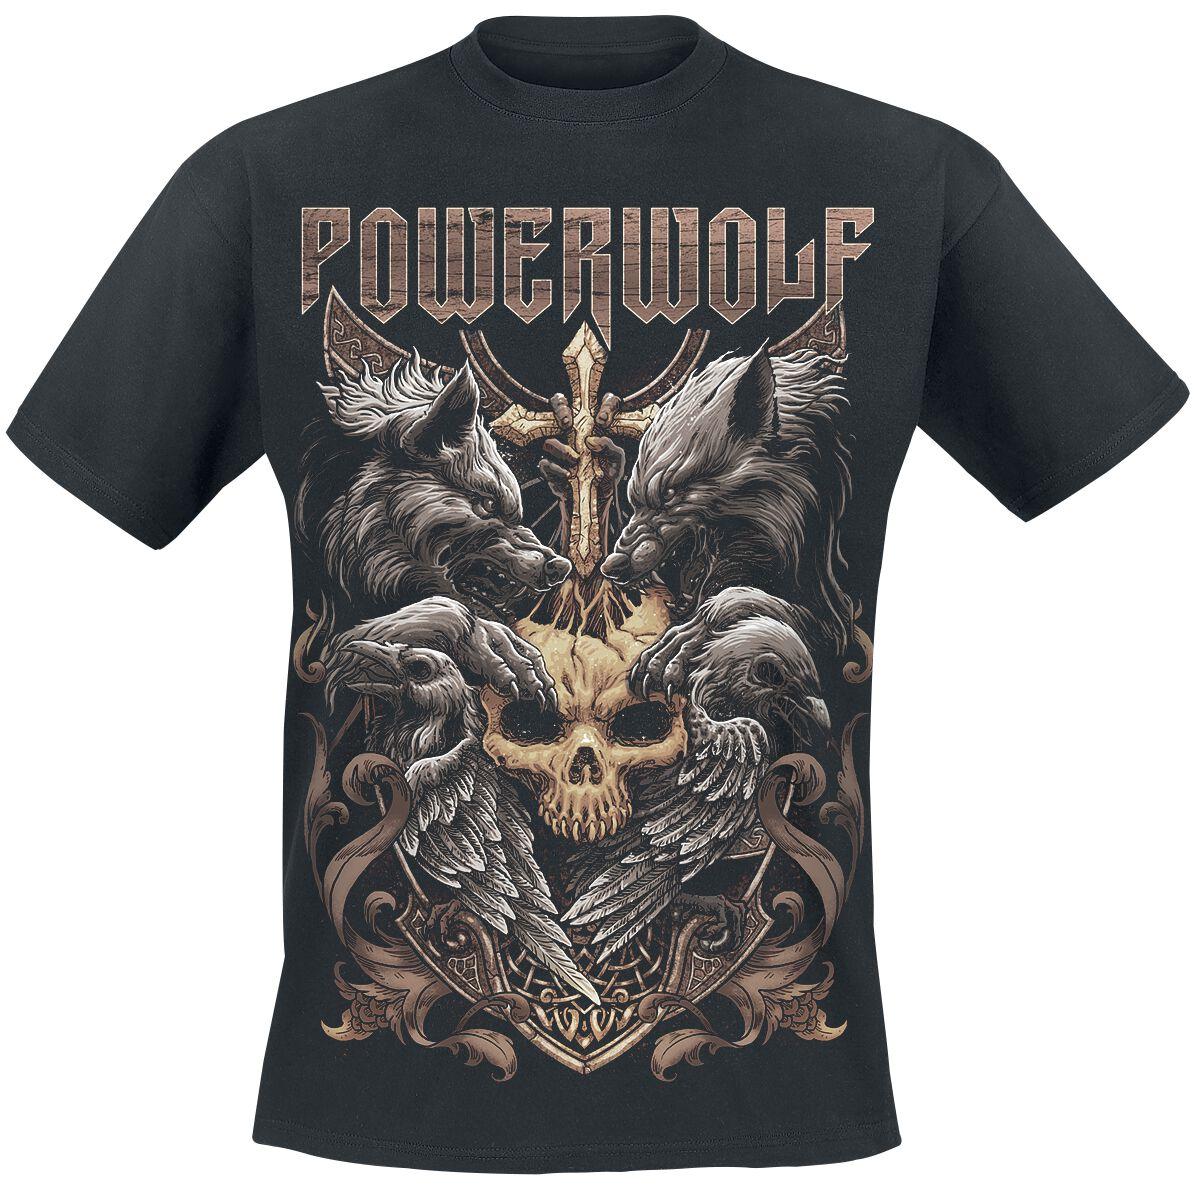 Image of   Powerwolf Wolves & Ravens T-Shirt sort